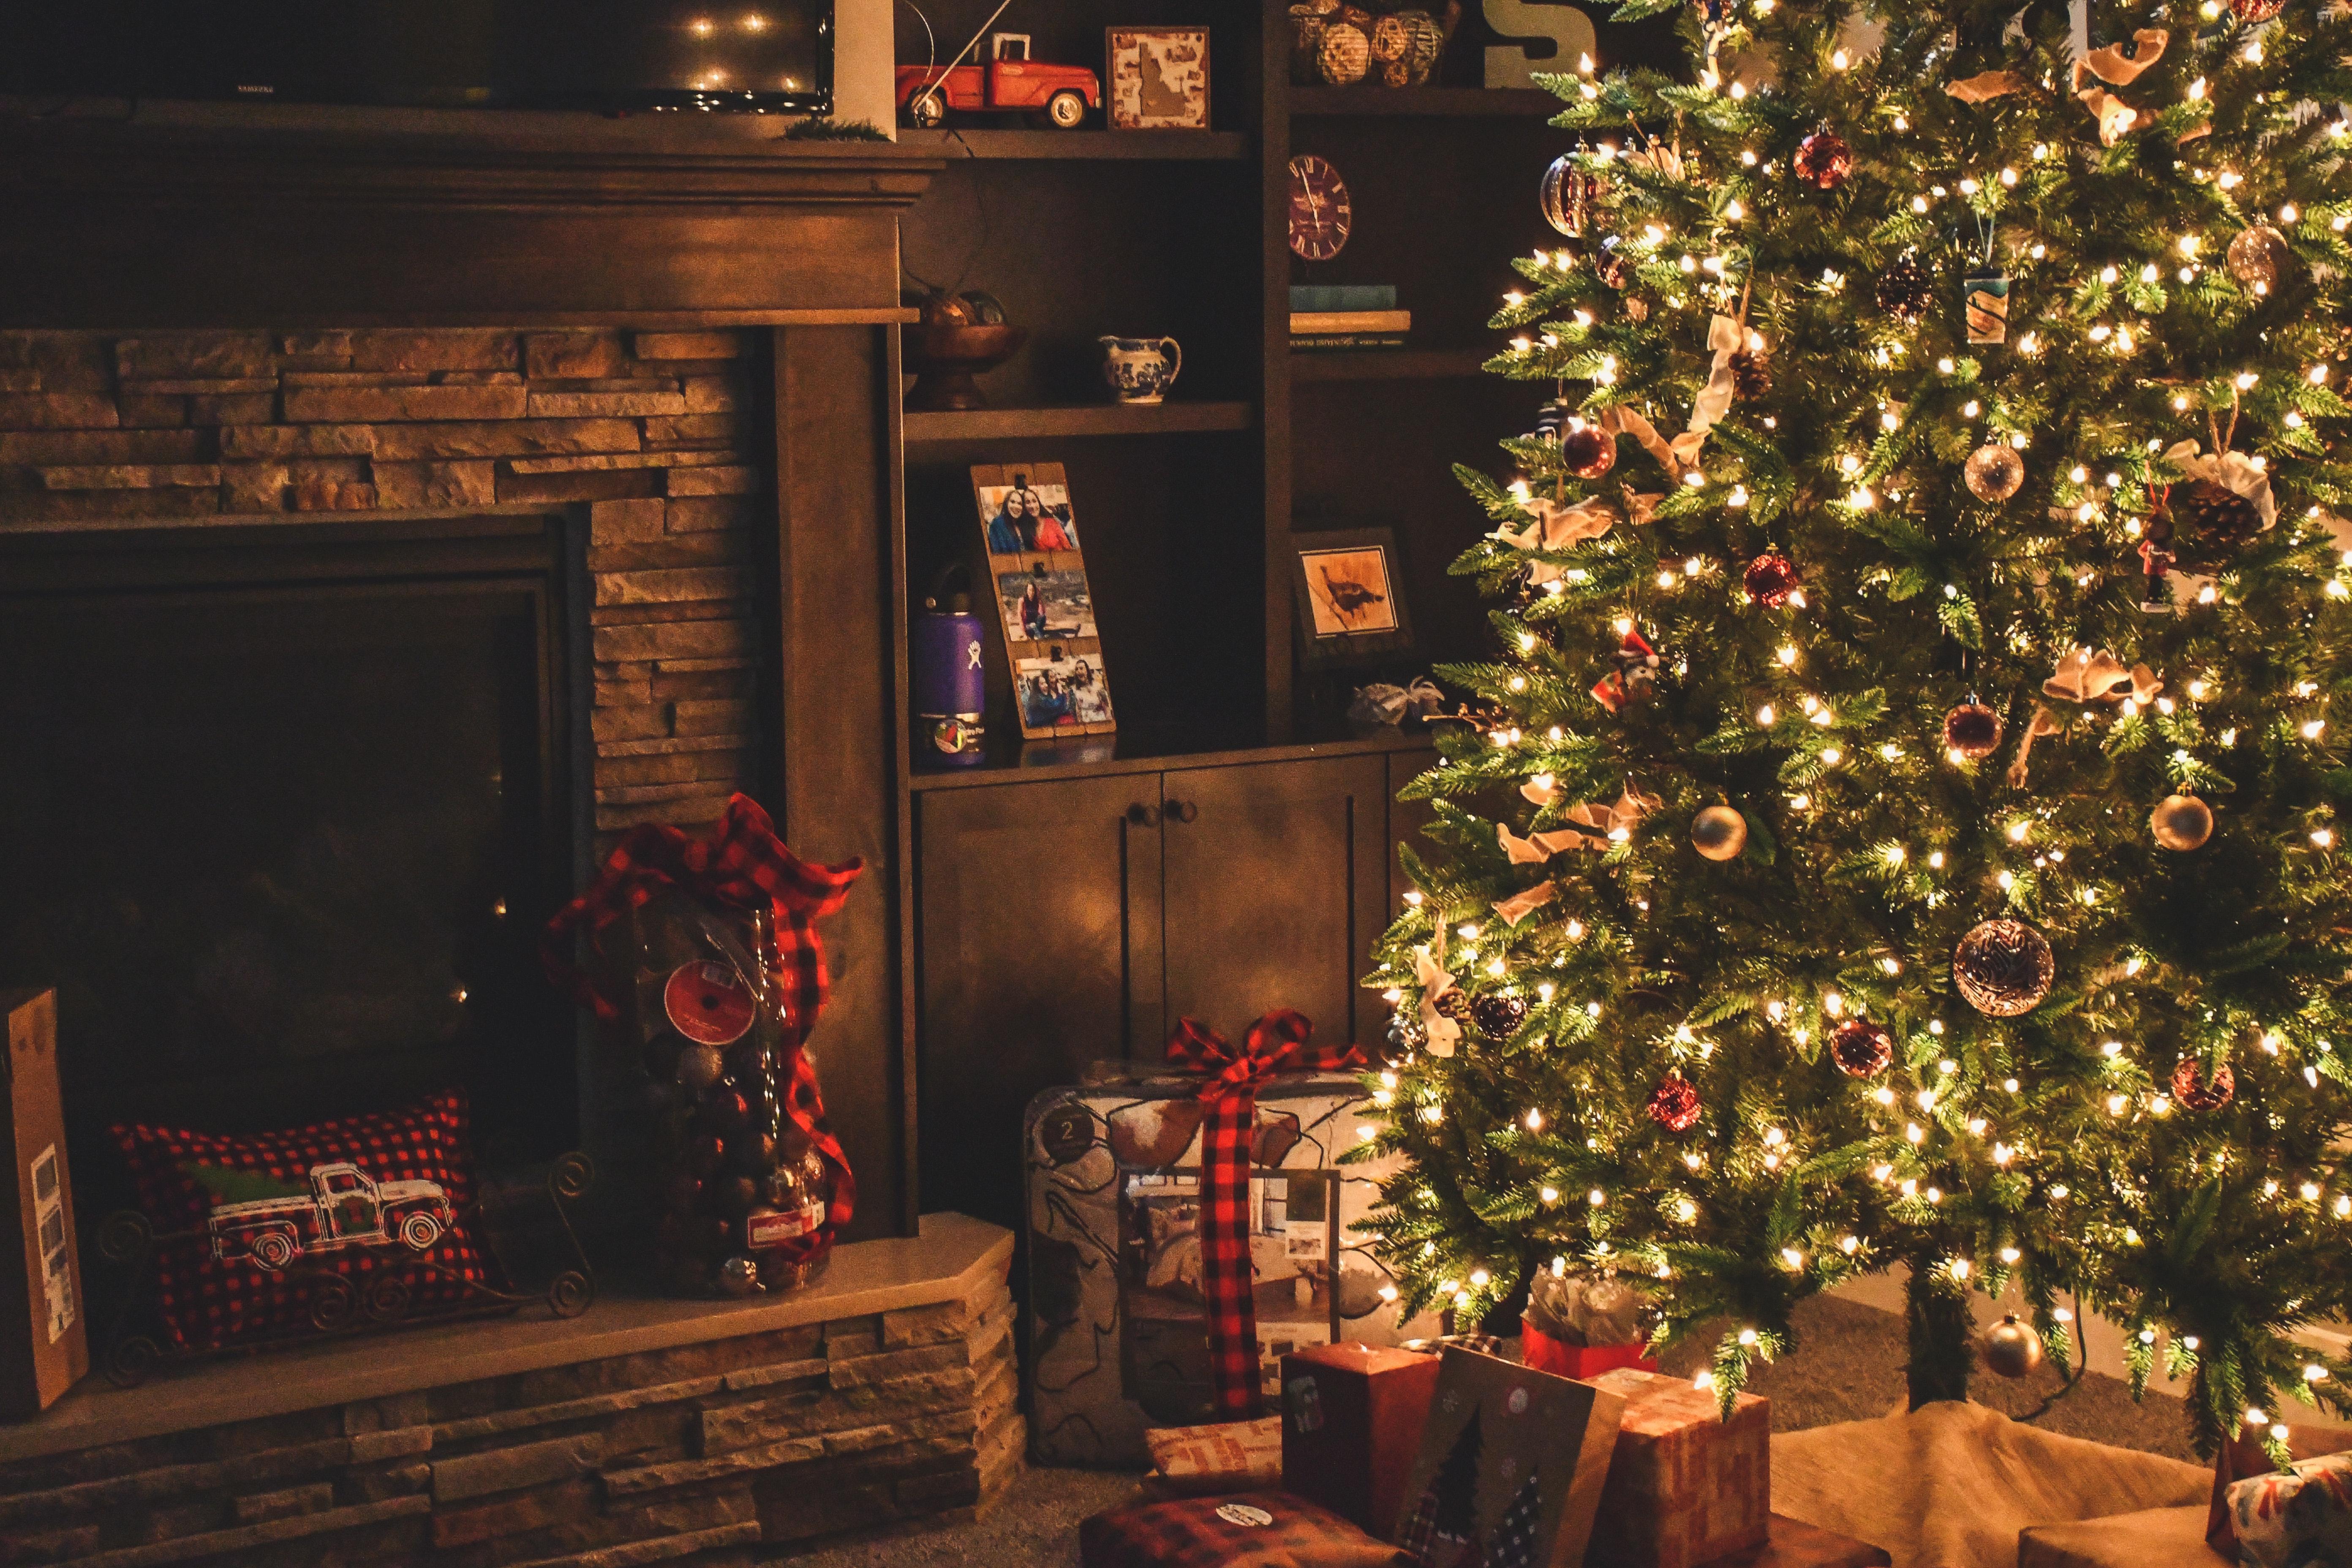 Kerstproof-Myhomeservices